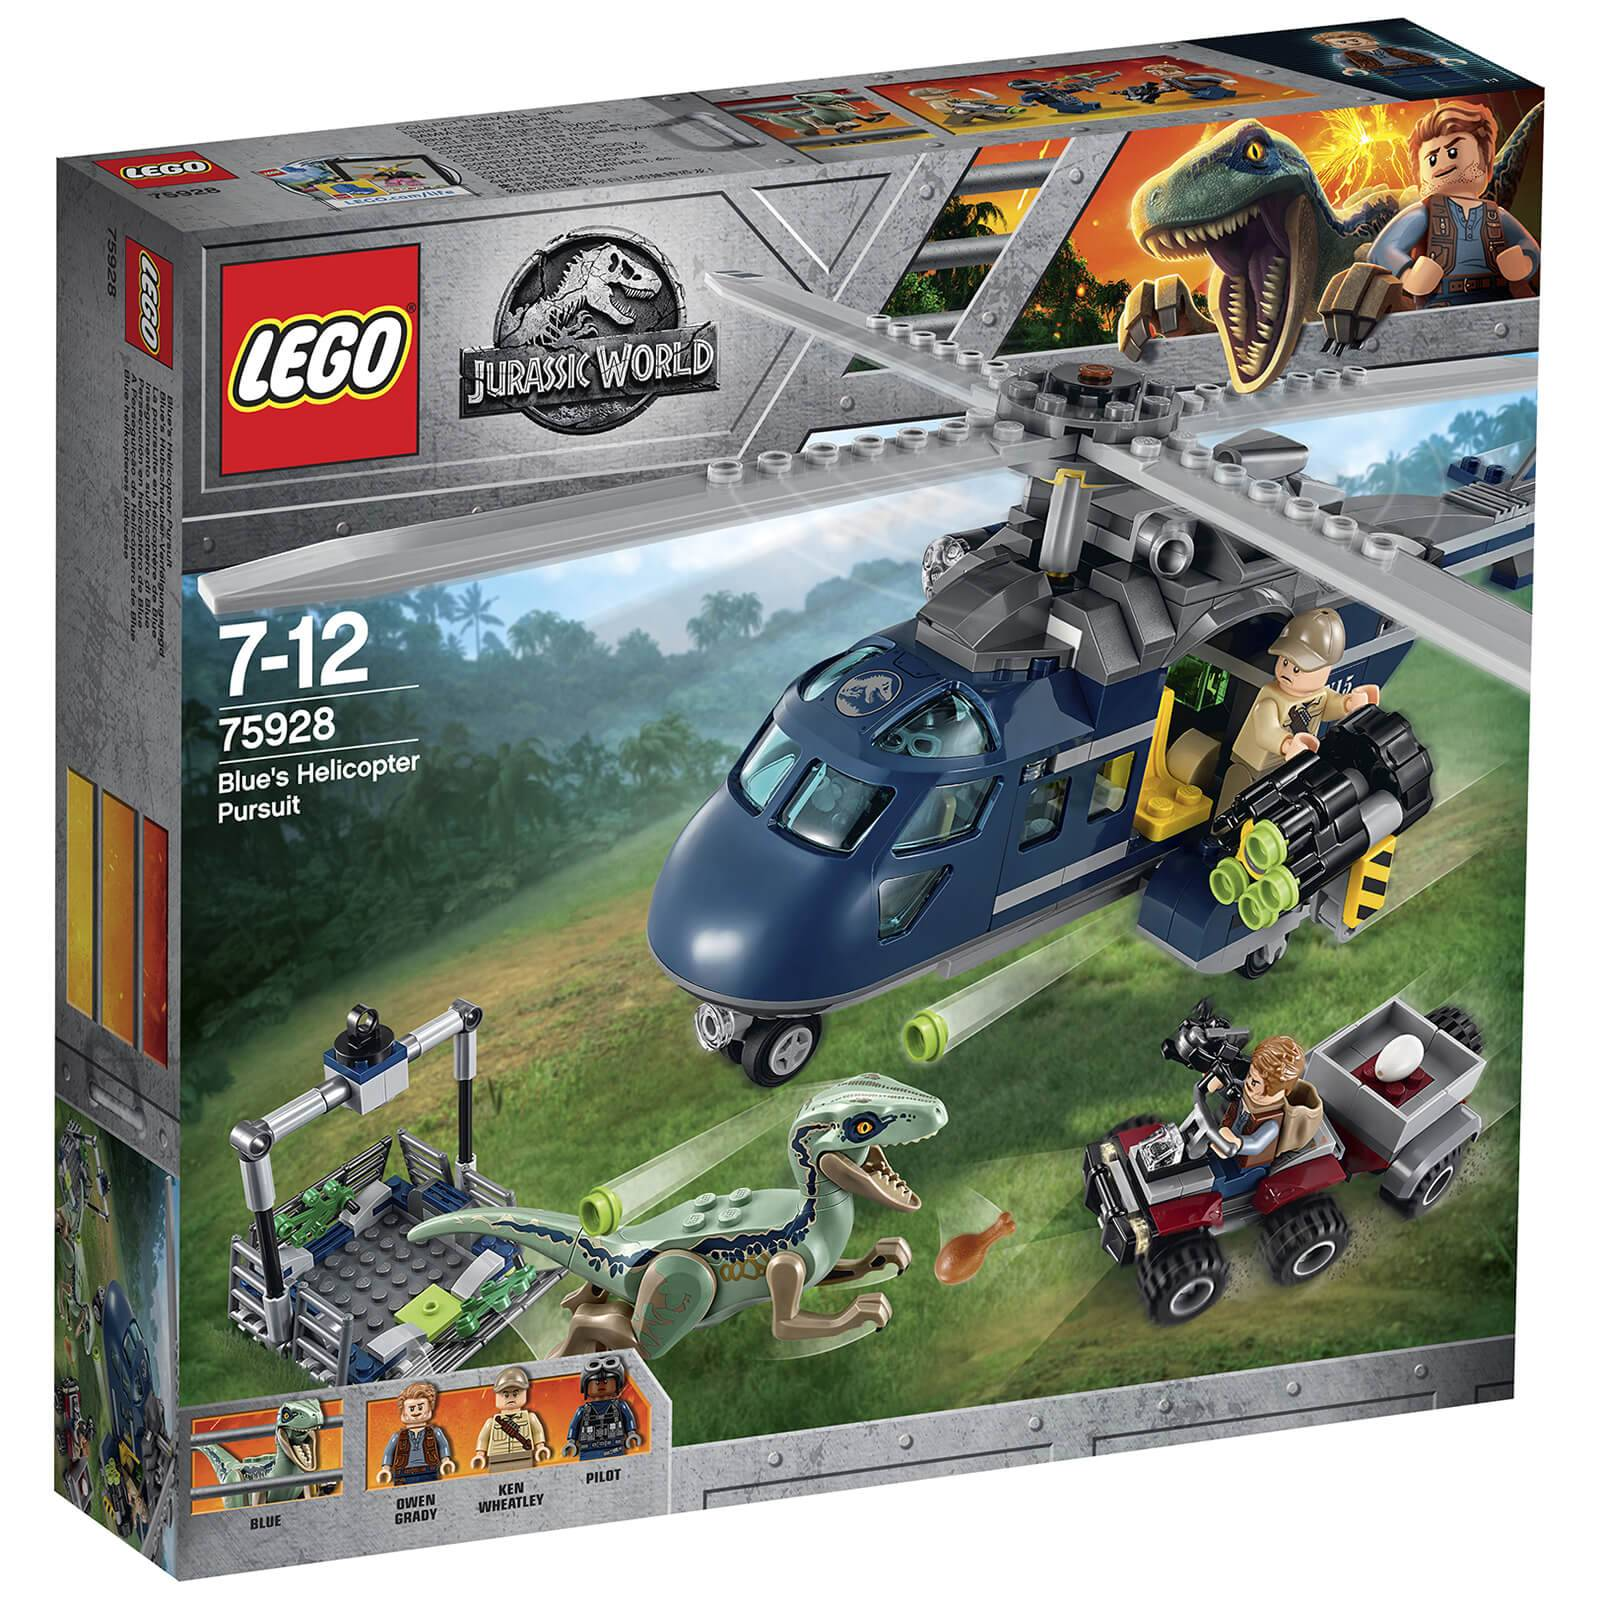 Lego Jurassic World Fallen Kingdom: Blue's Helicopter Pursuit (75928)